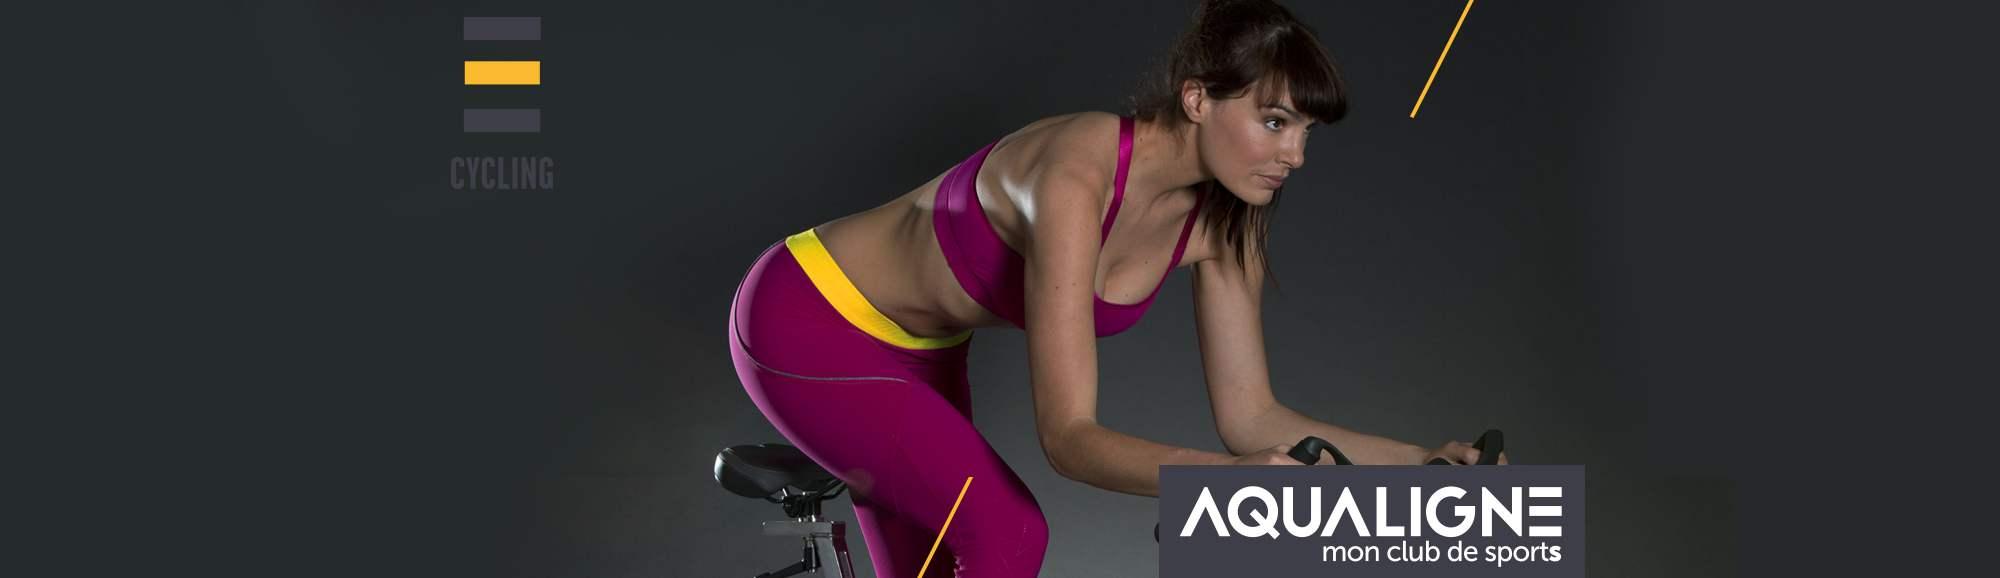 AQUALIGNE-cycling-club-RPM